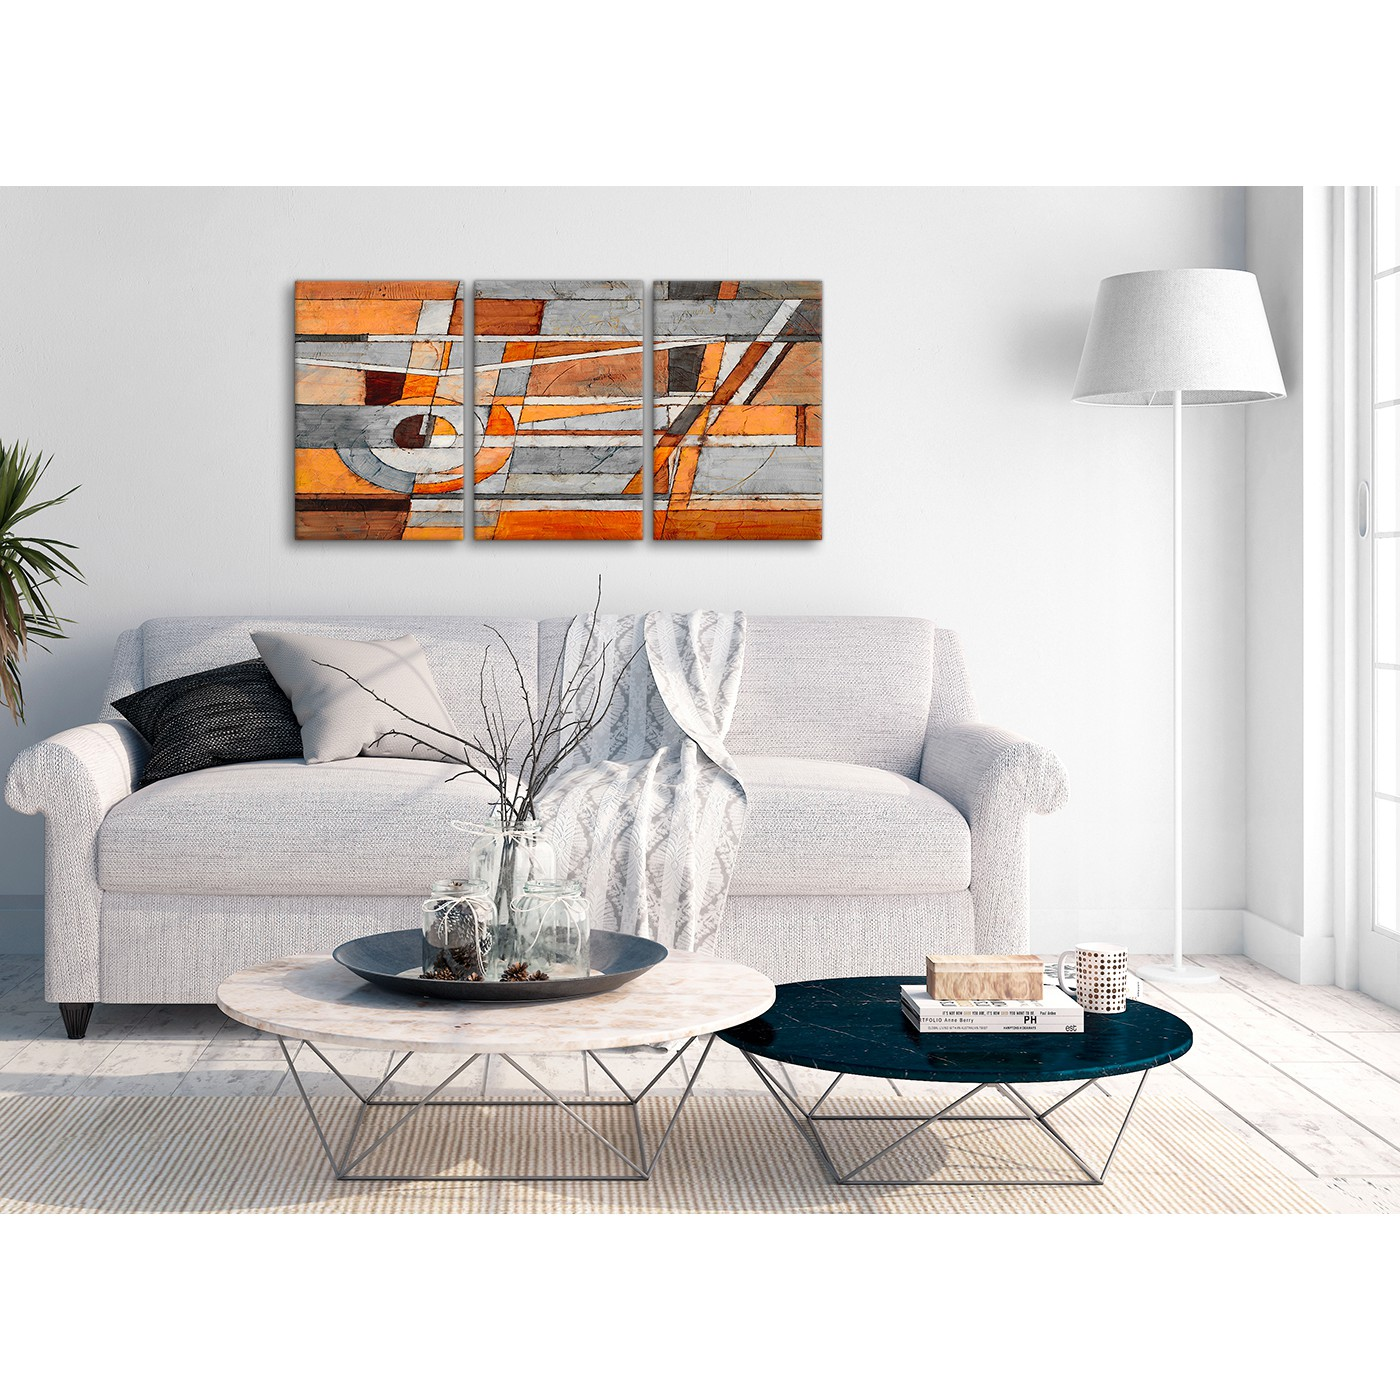 3 Piece Burnt Orange Grey Painting Office Canvas Wall Art Decor ...